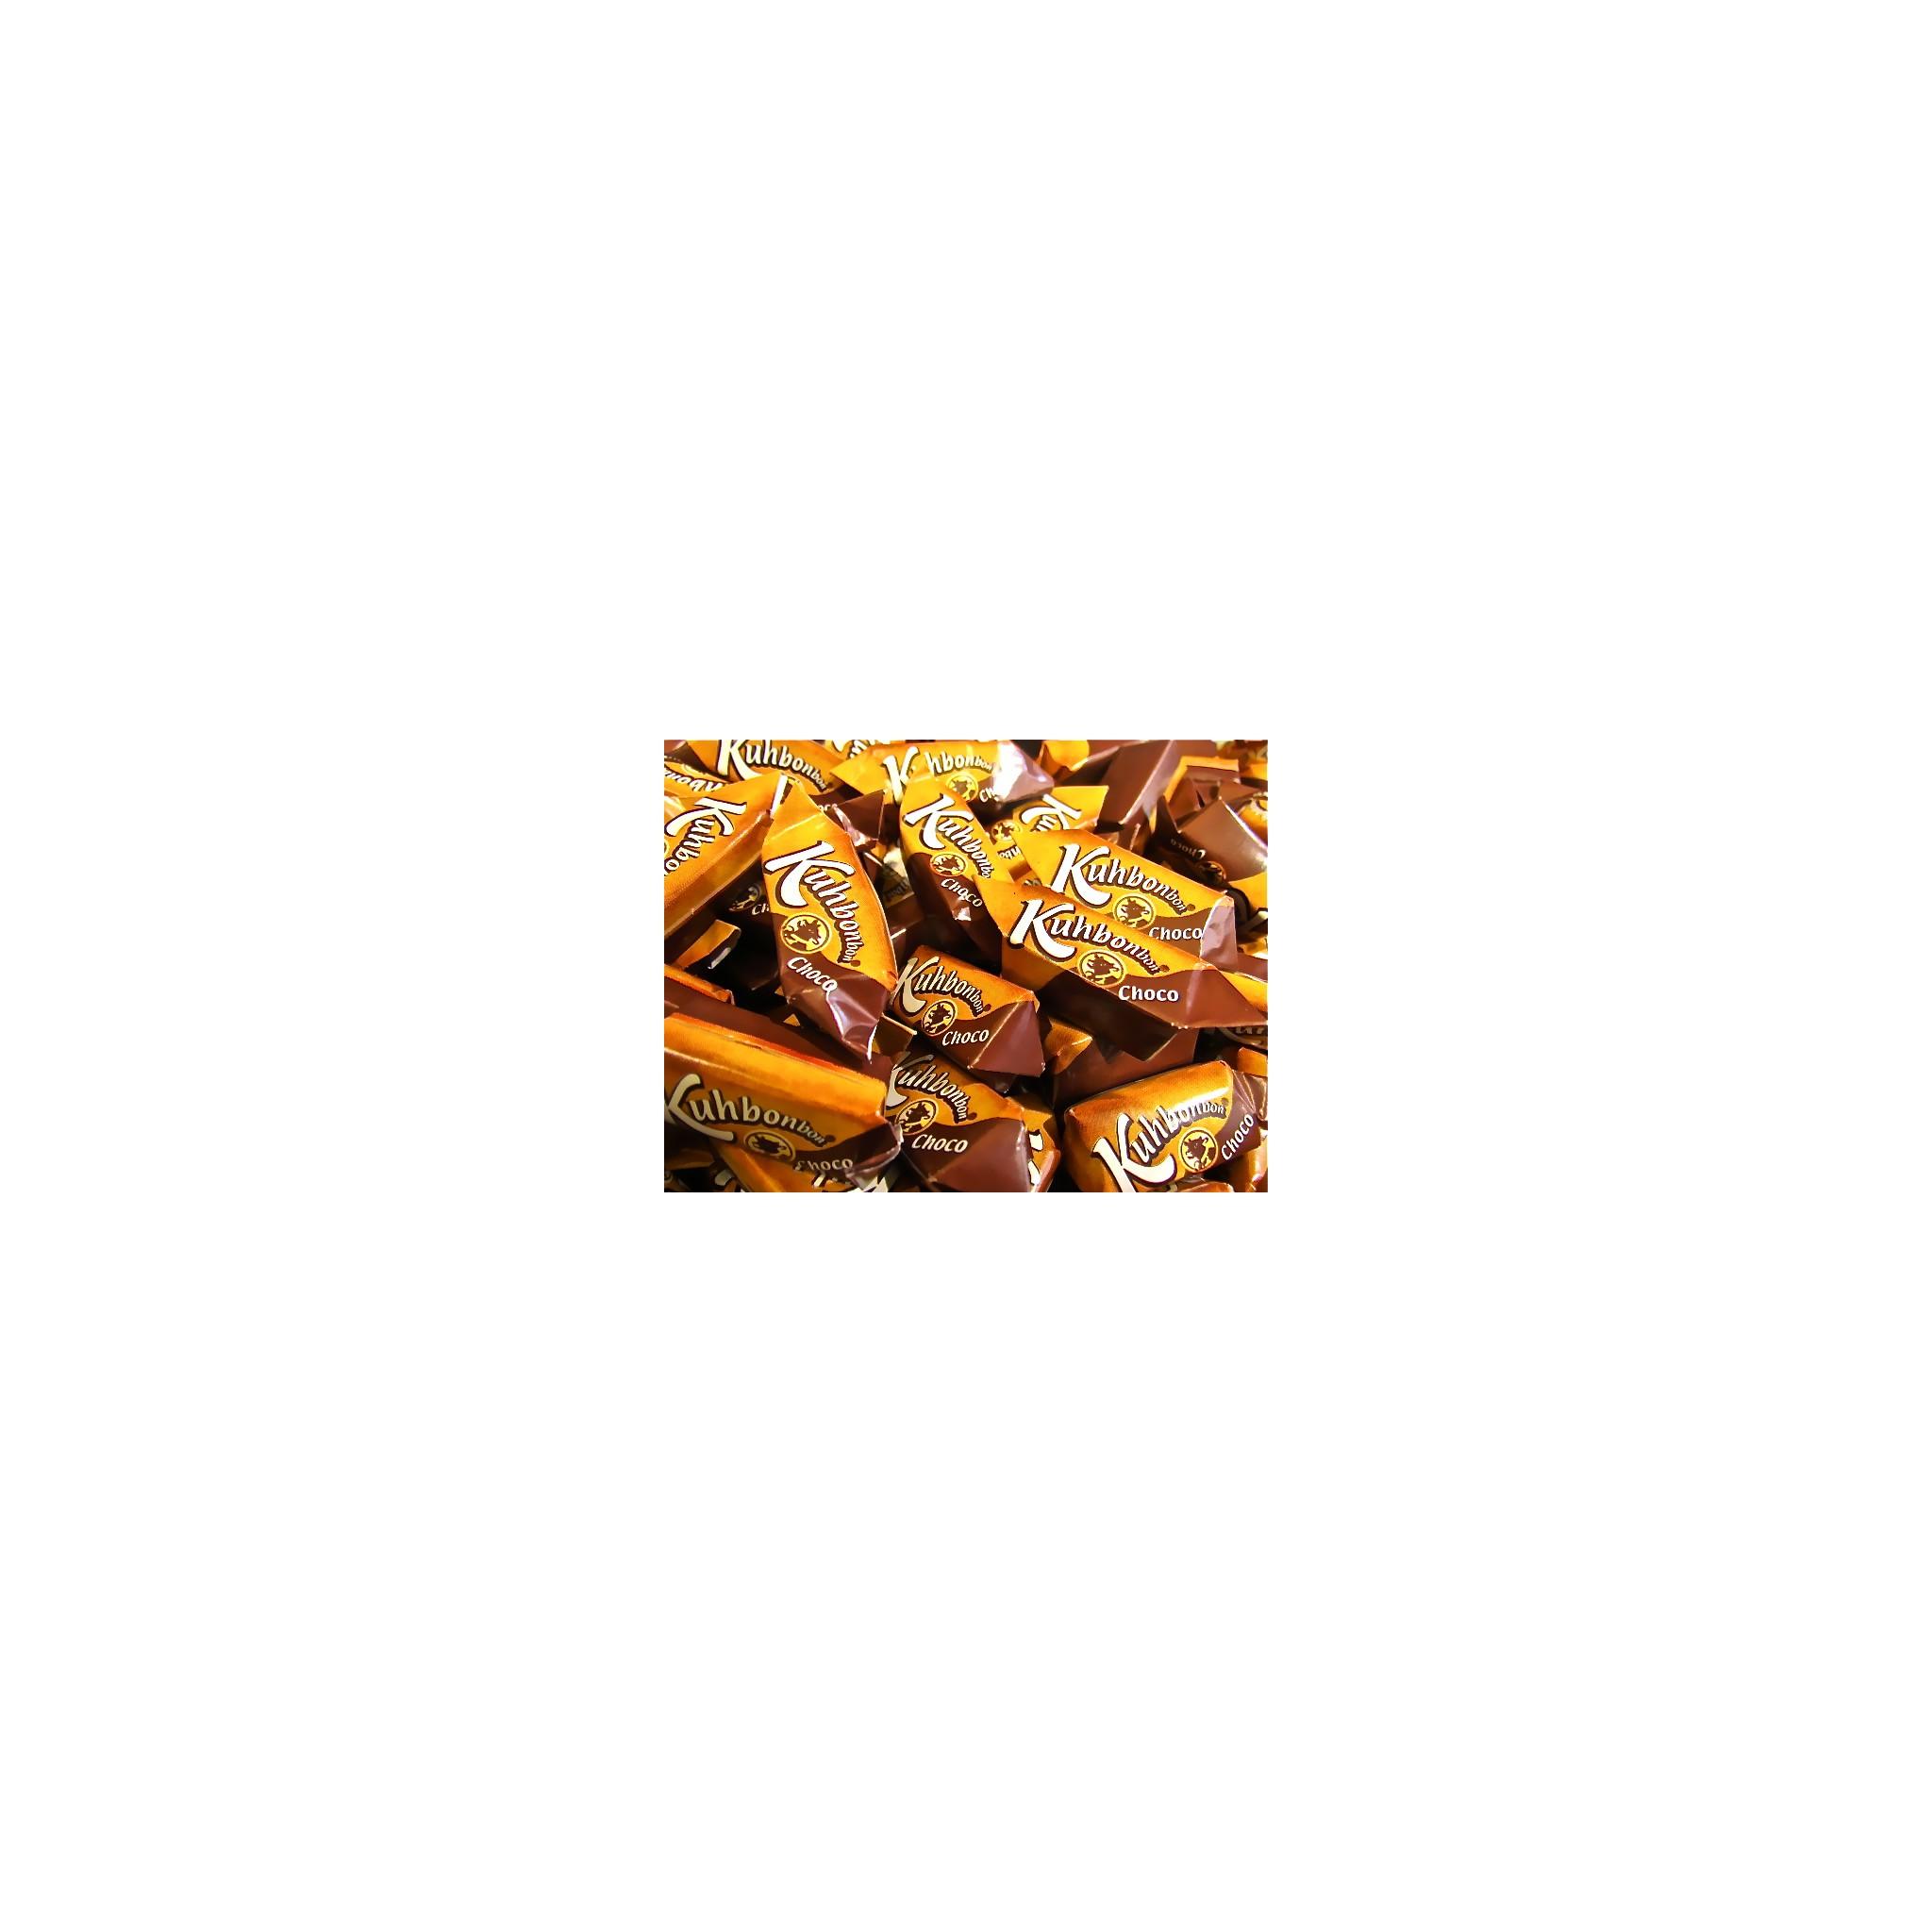 Vendita Online Caramelle Toffee Kuhbonbon Choco. Shop On